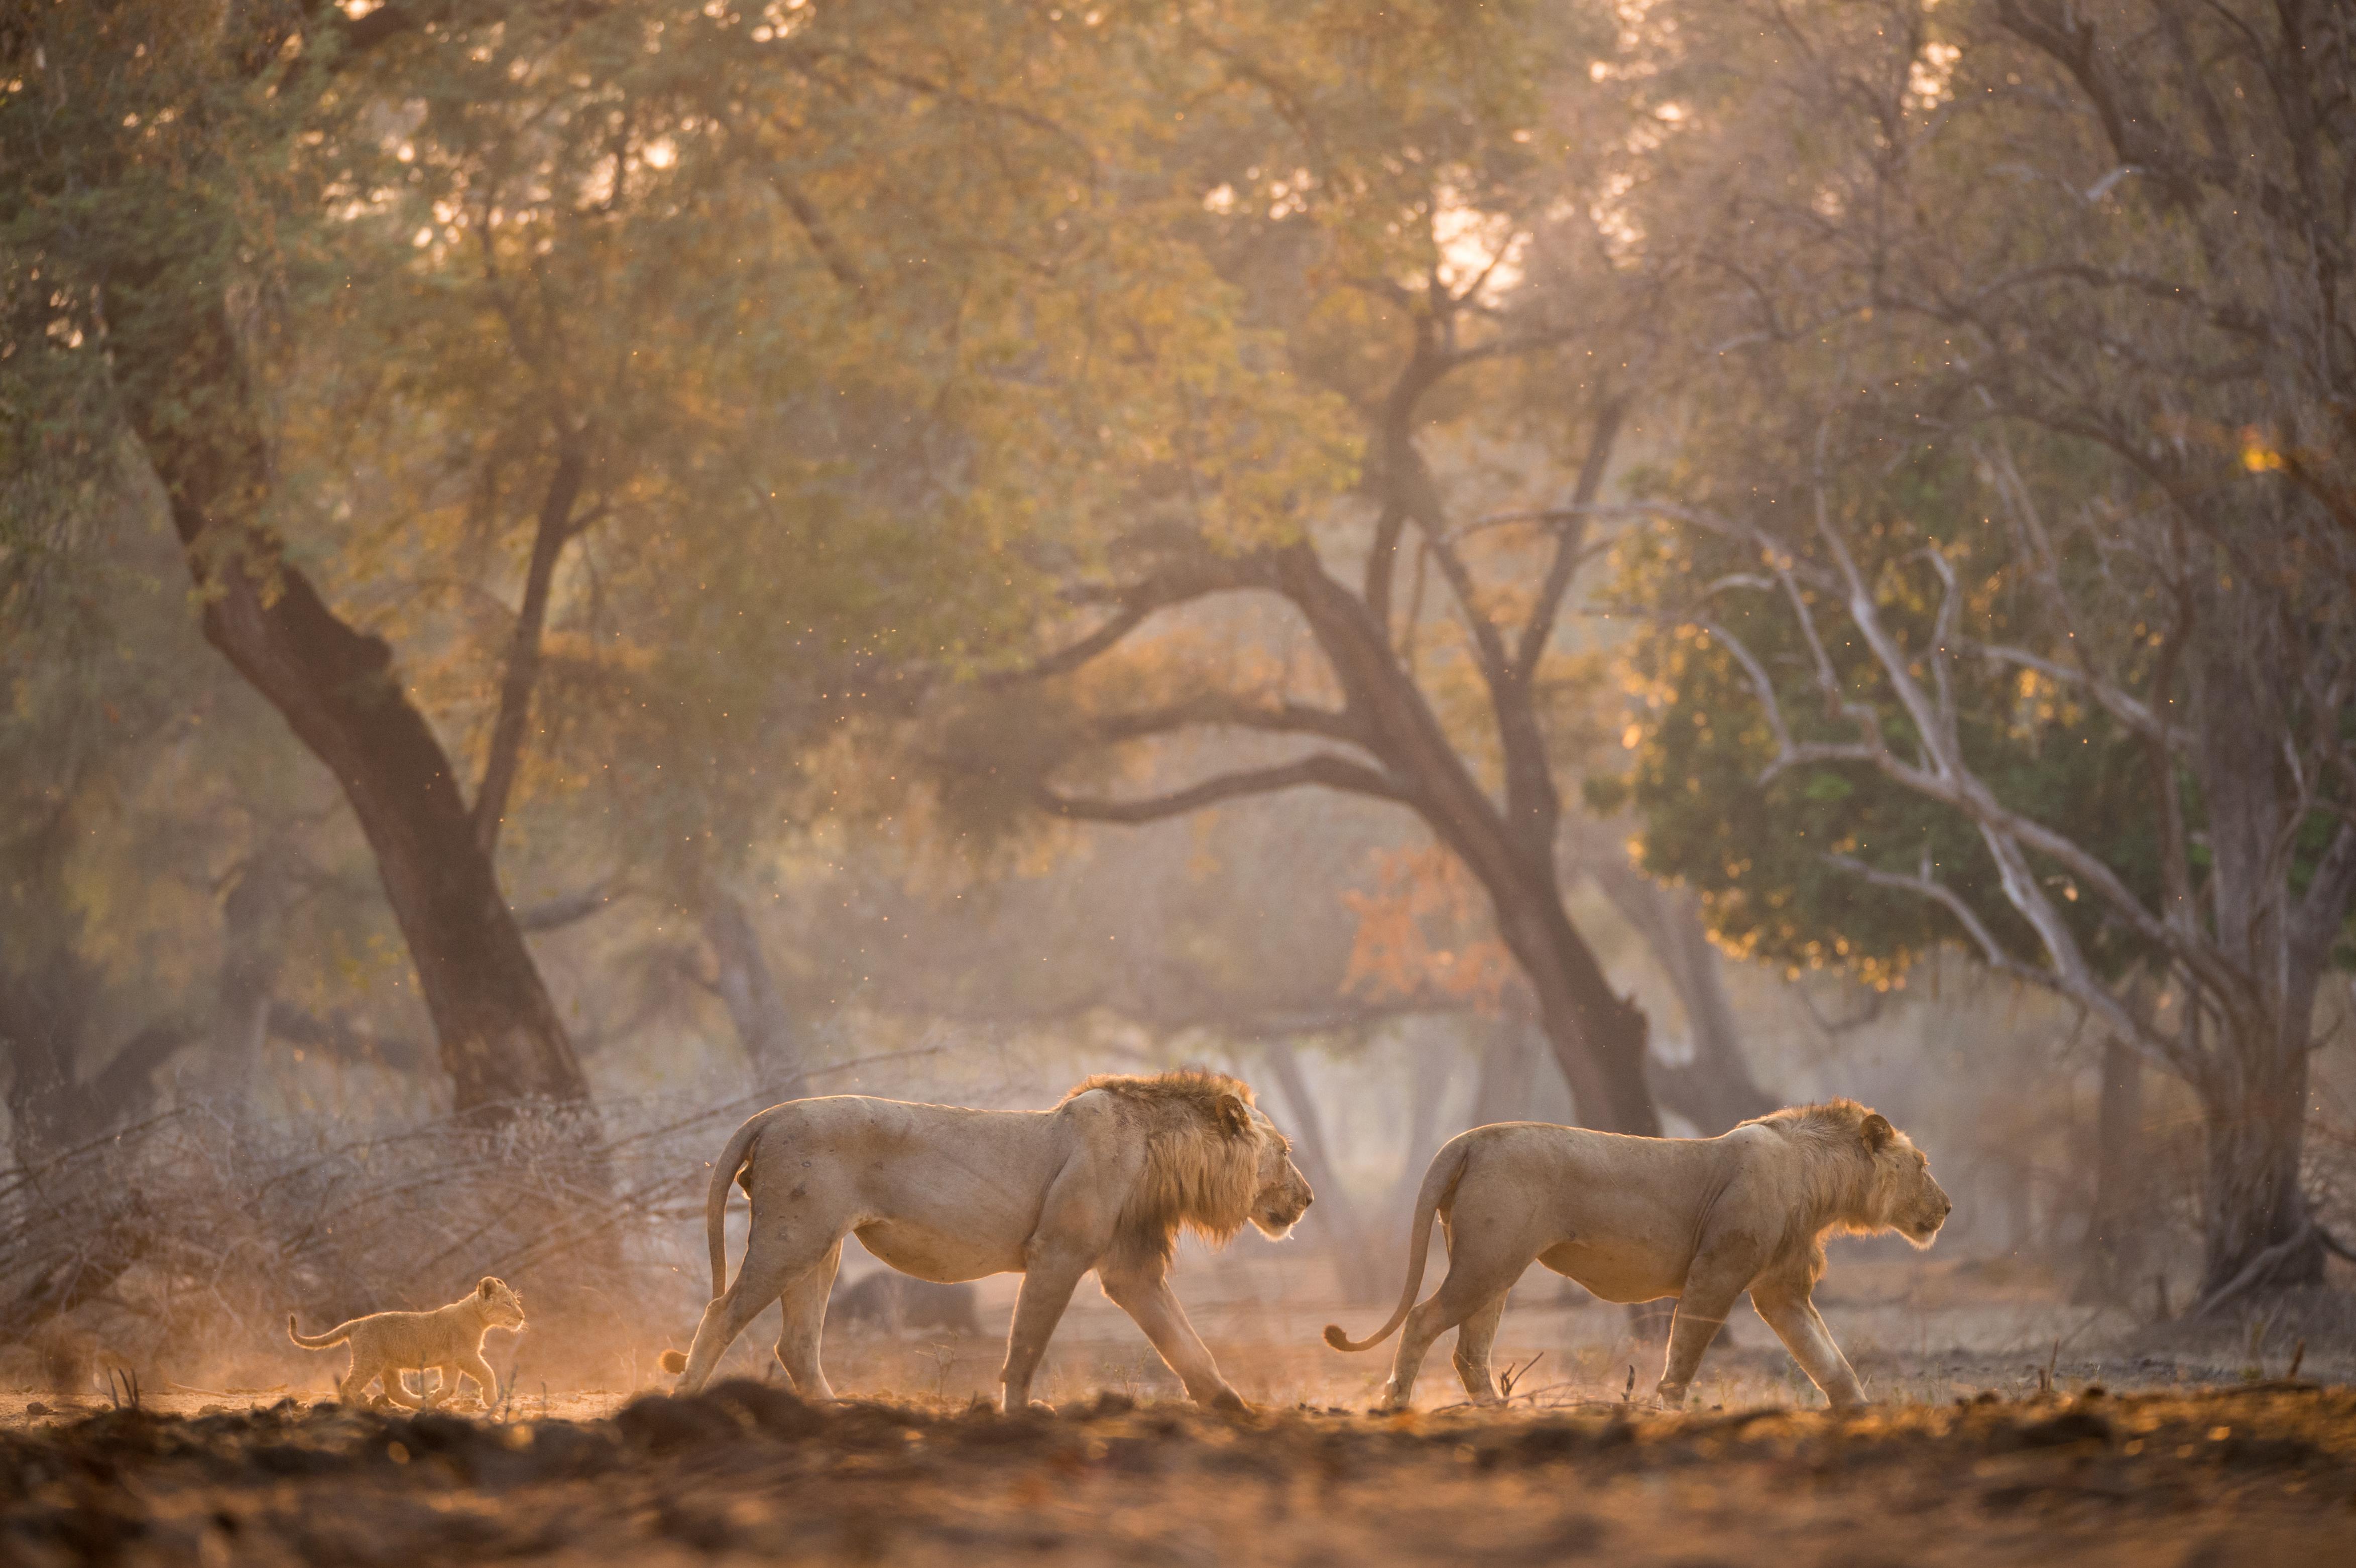 chikwenya_wildlife_hi_res_-_kyle_and_rut